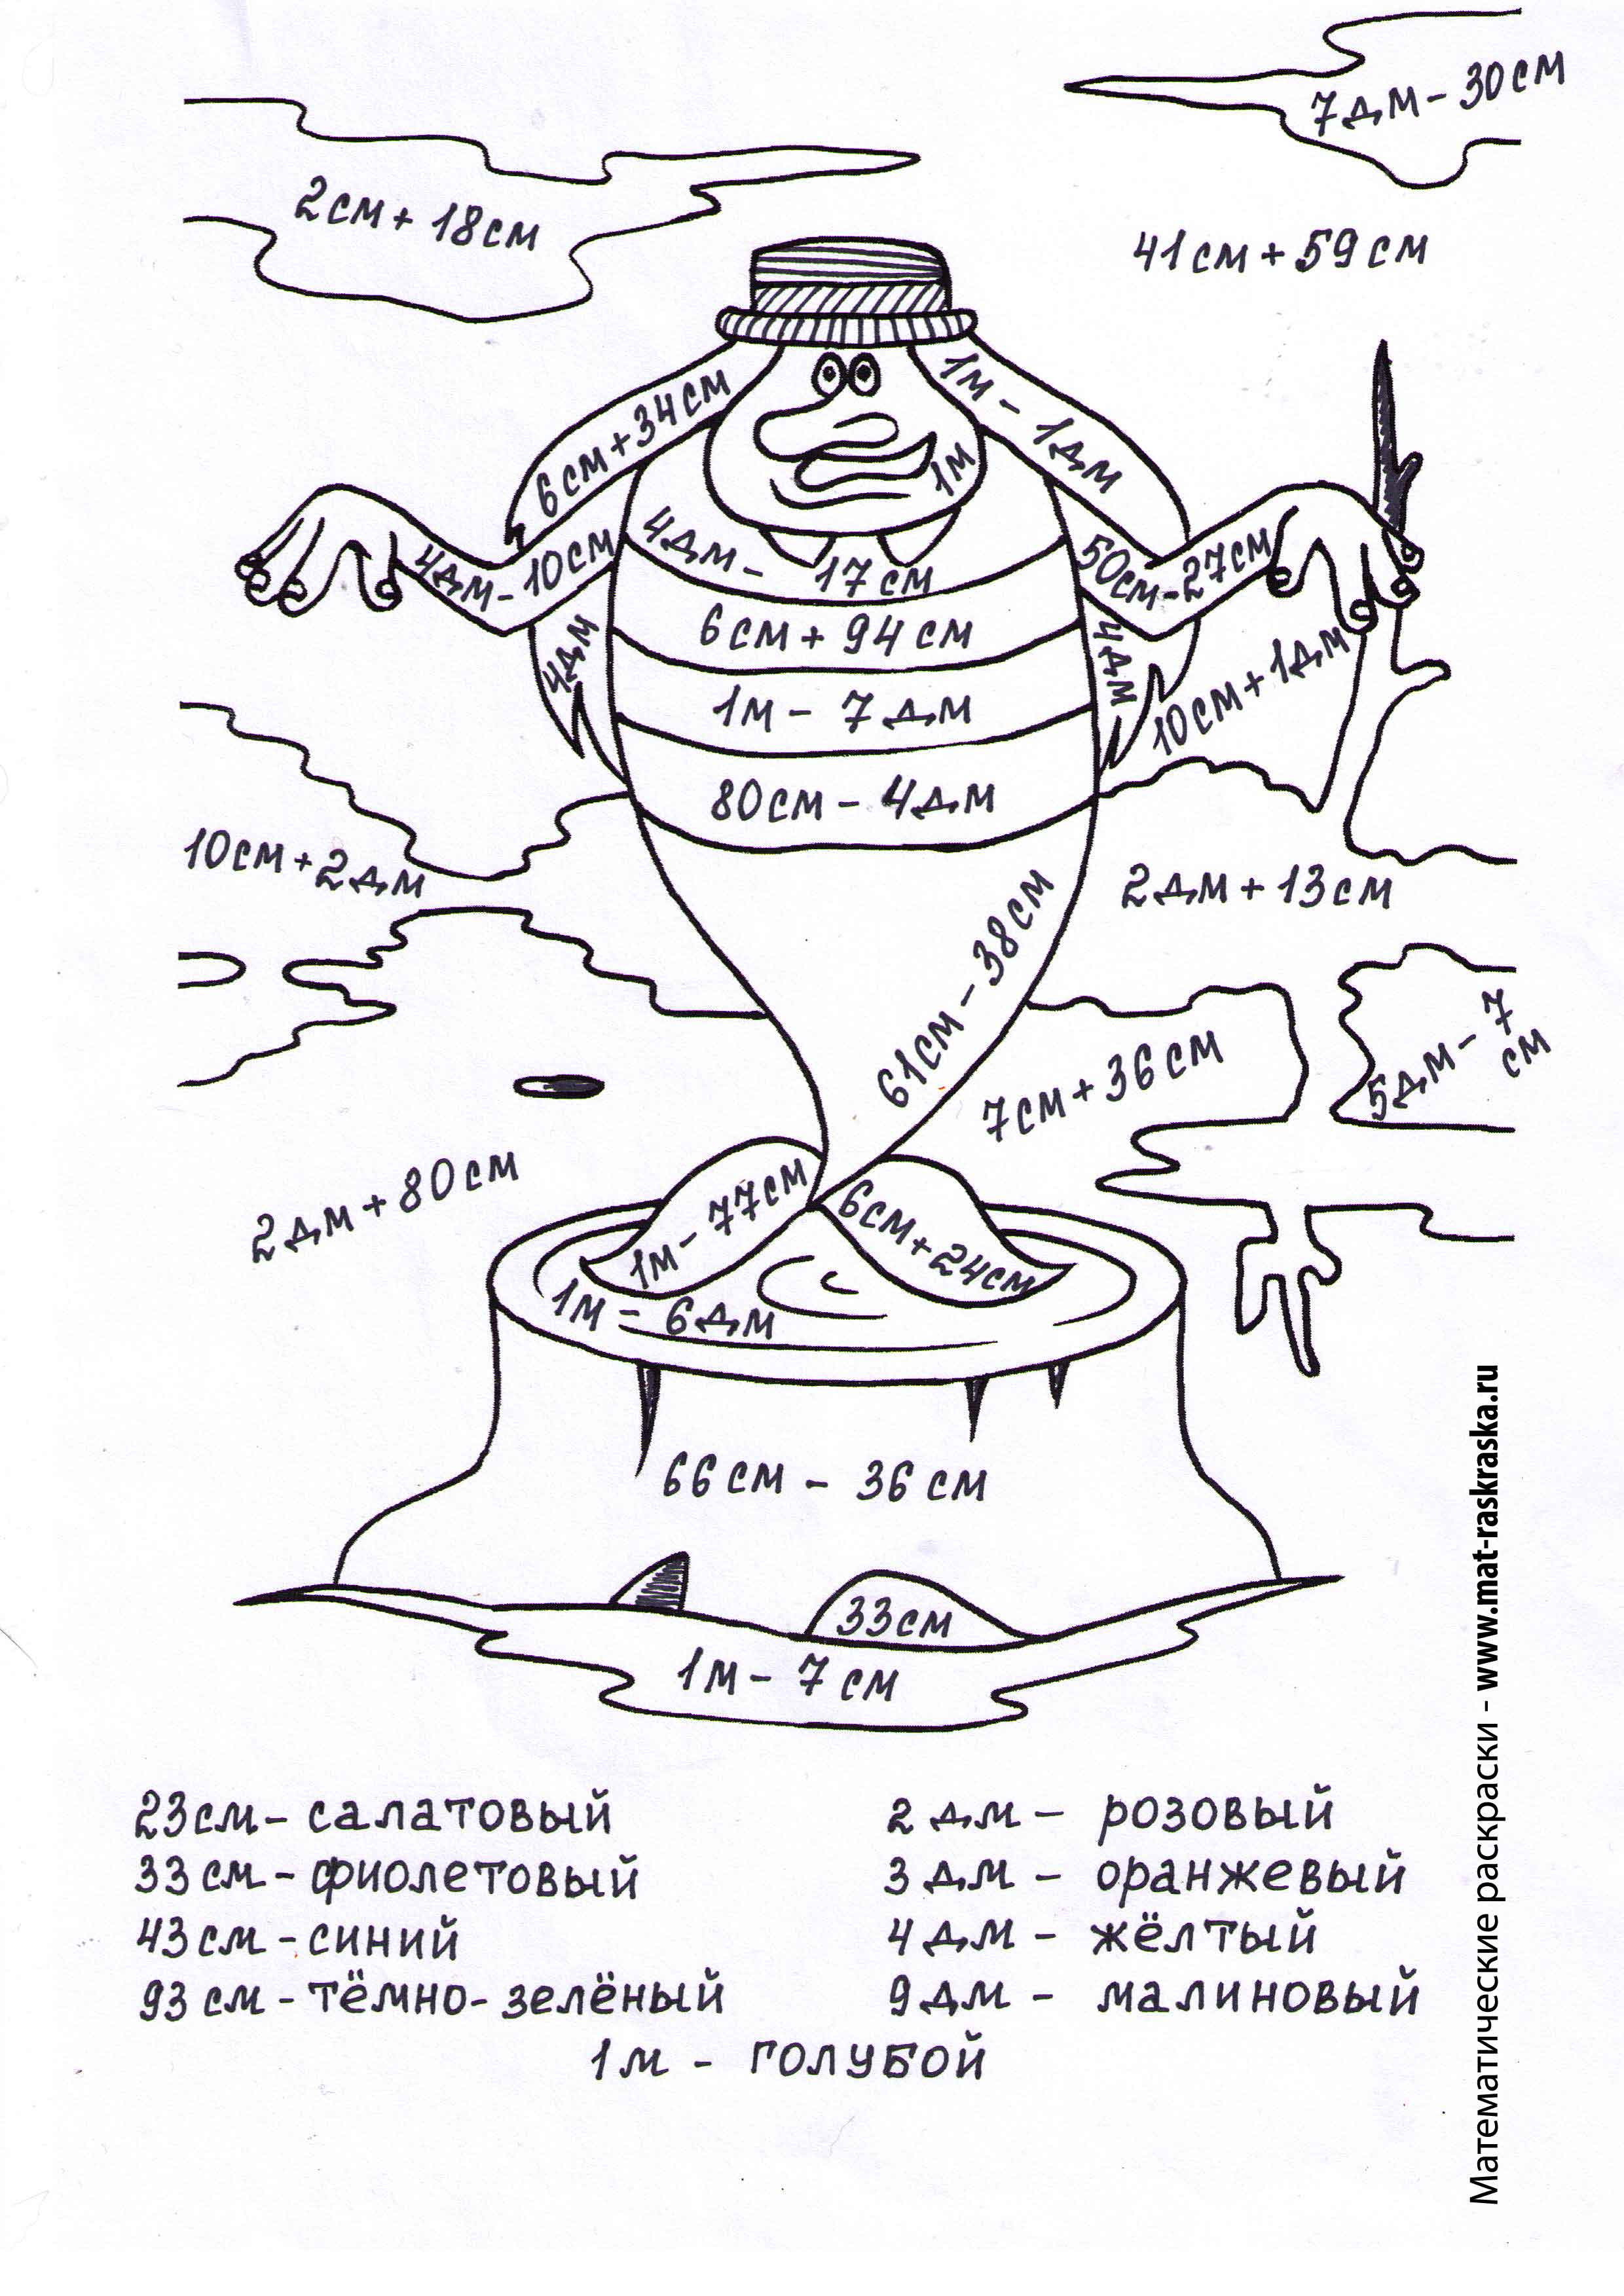 http://www.mat-raskraska.ru/images/stories/Raskraski/Deistvia-s-velichinami/vodyanoi-deistvia-s-velich-2ur-slozn-rskr1_big.jpg